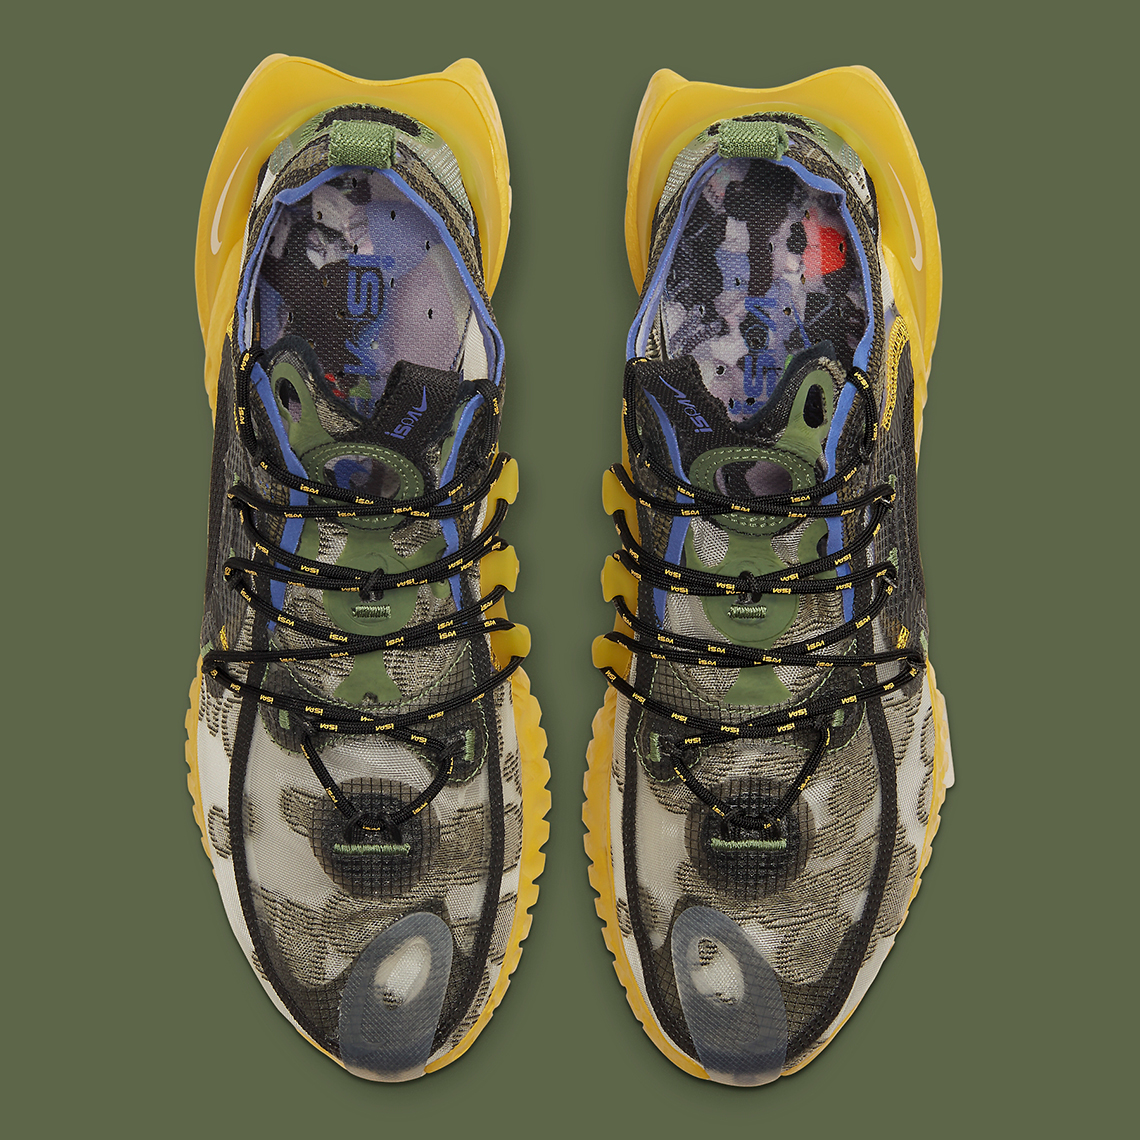 Nike-ISPA-Flow-2020-Medium-Olive-3.jpg?w=1140